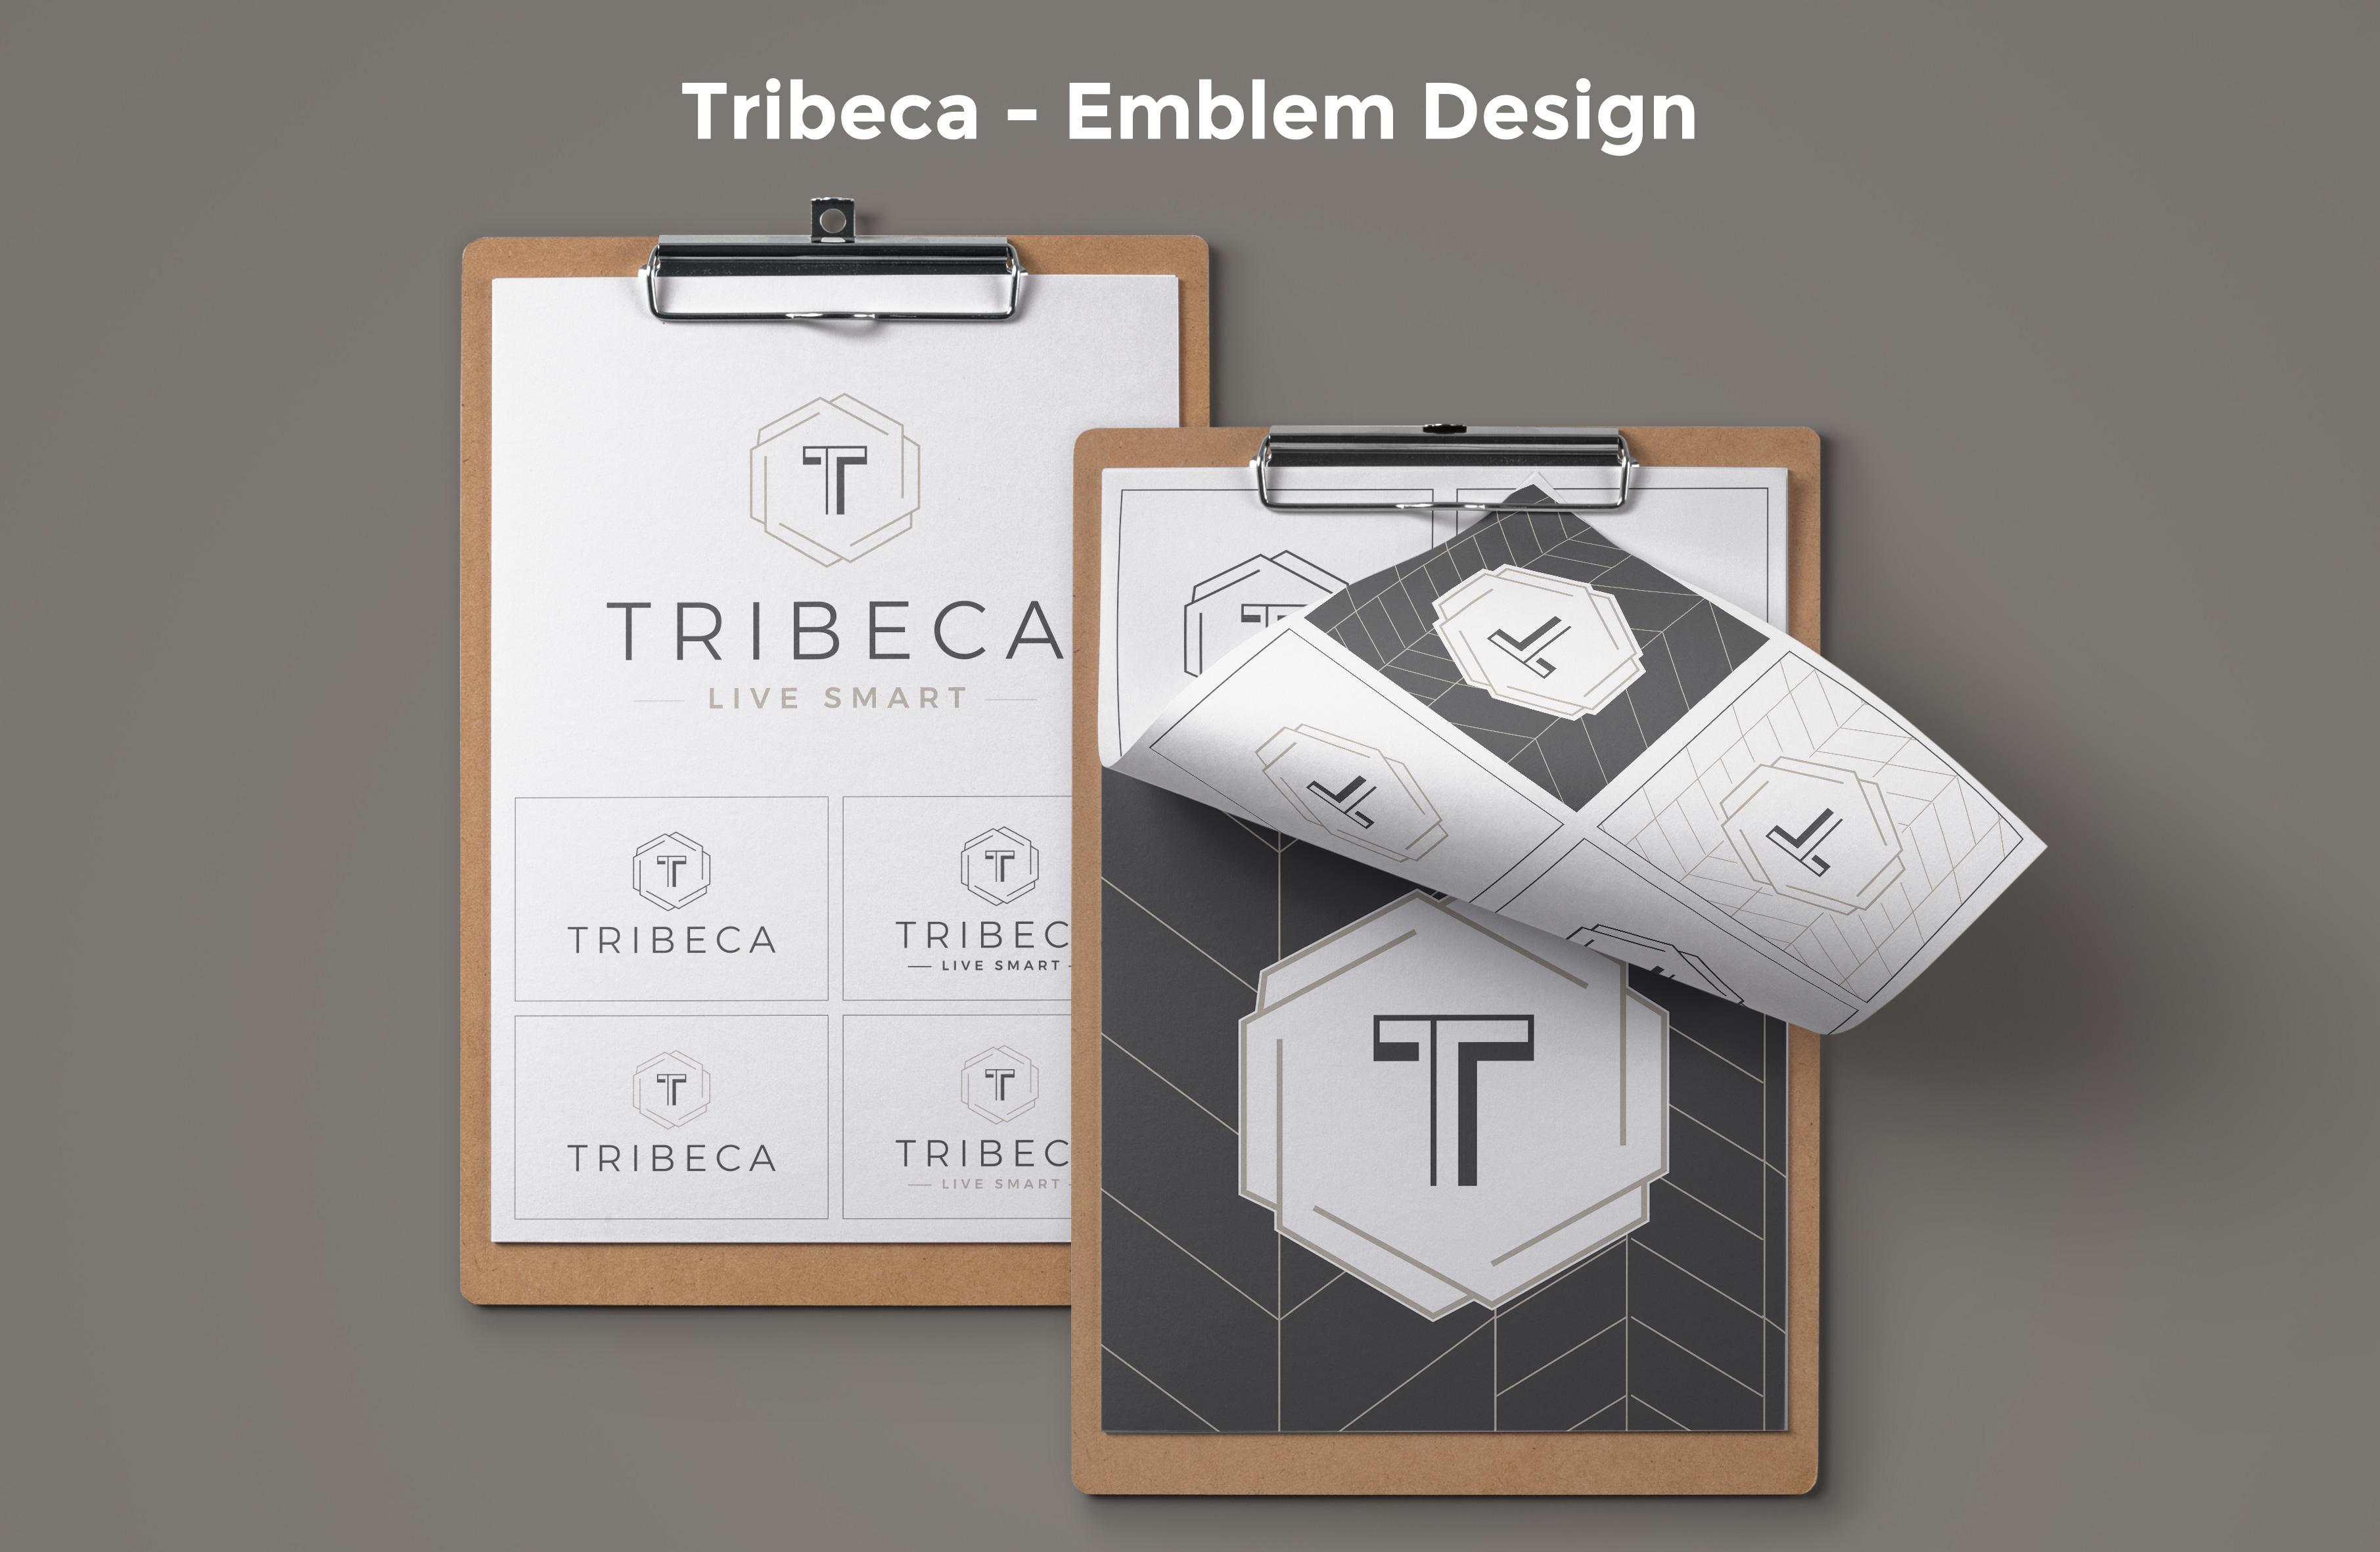 Tribeca Emblem Design